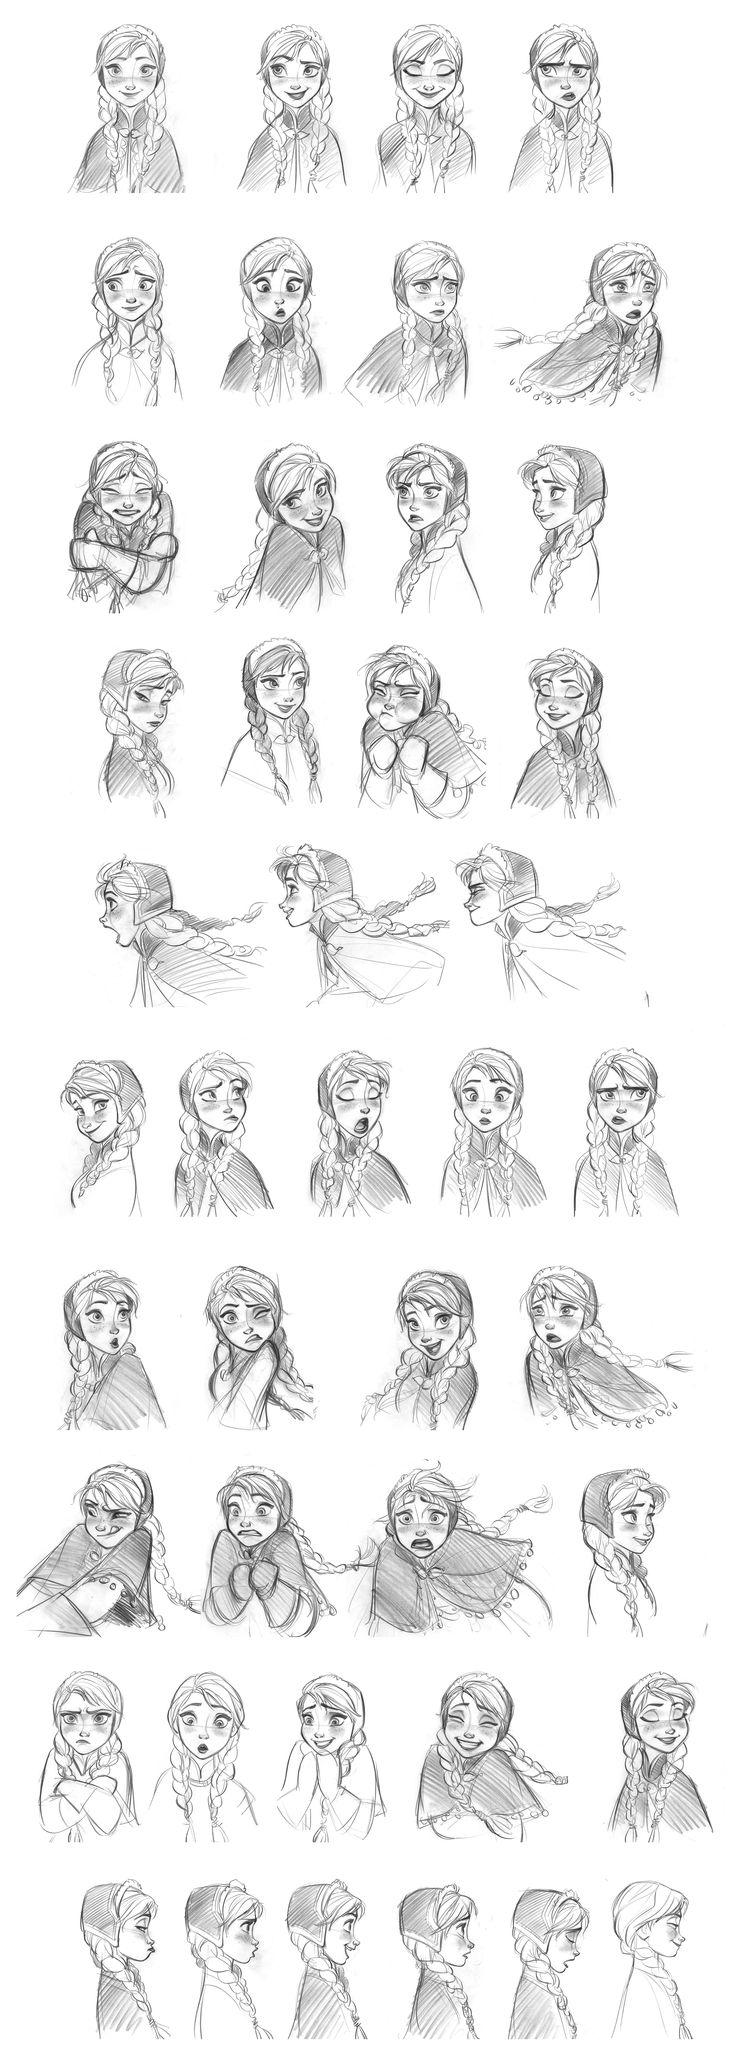 La Reines des Neiges ♥ - Anna